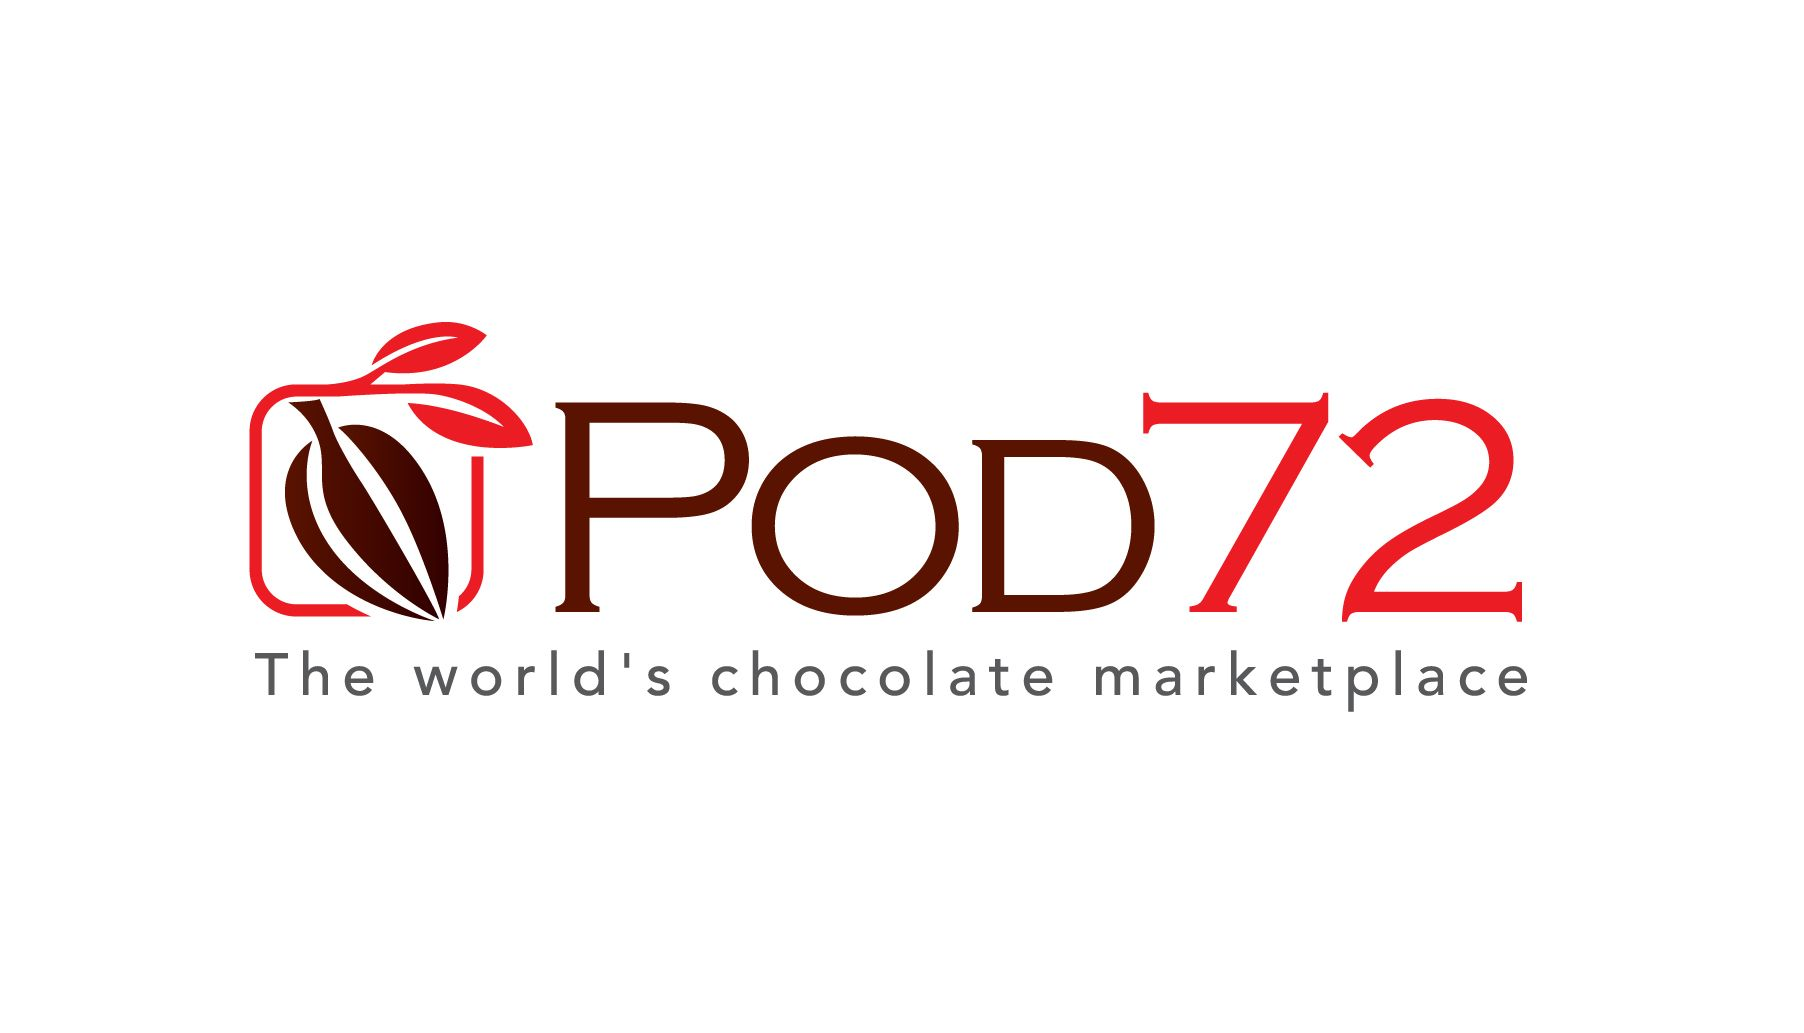 Pod72-05-01color info